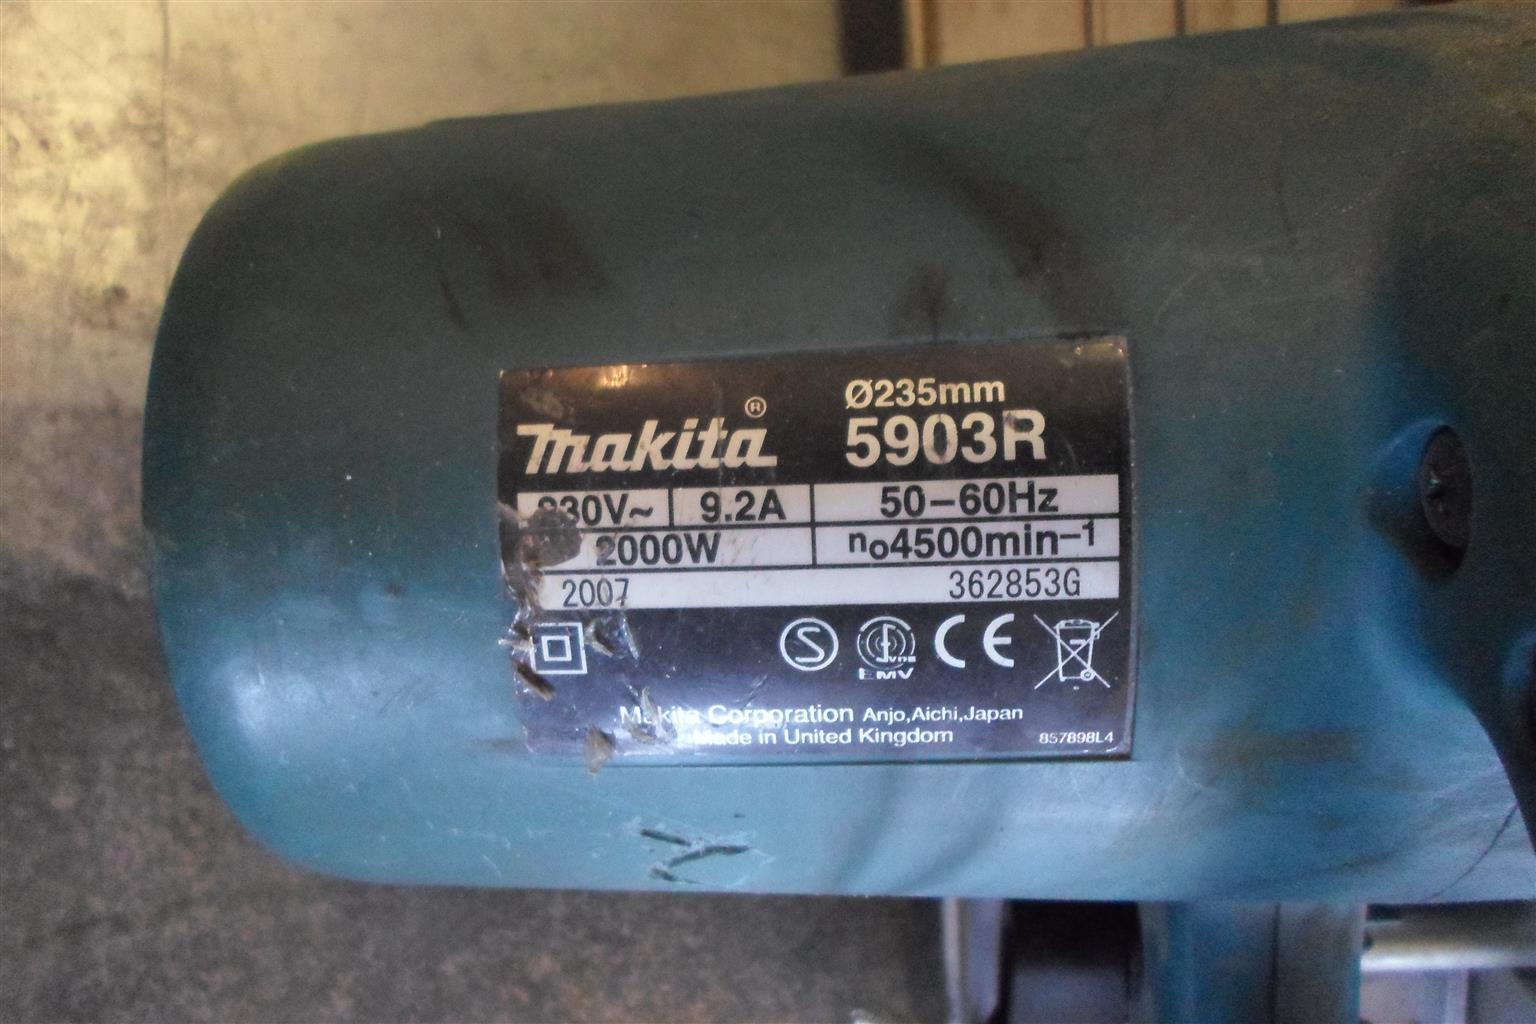 2000W Makita 5903R Circular Saw - B033042197-2